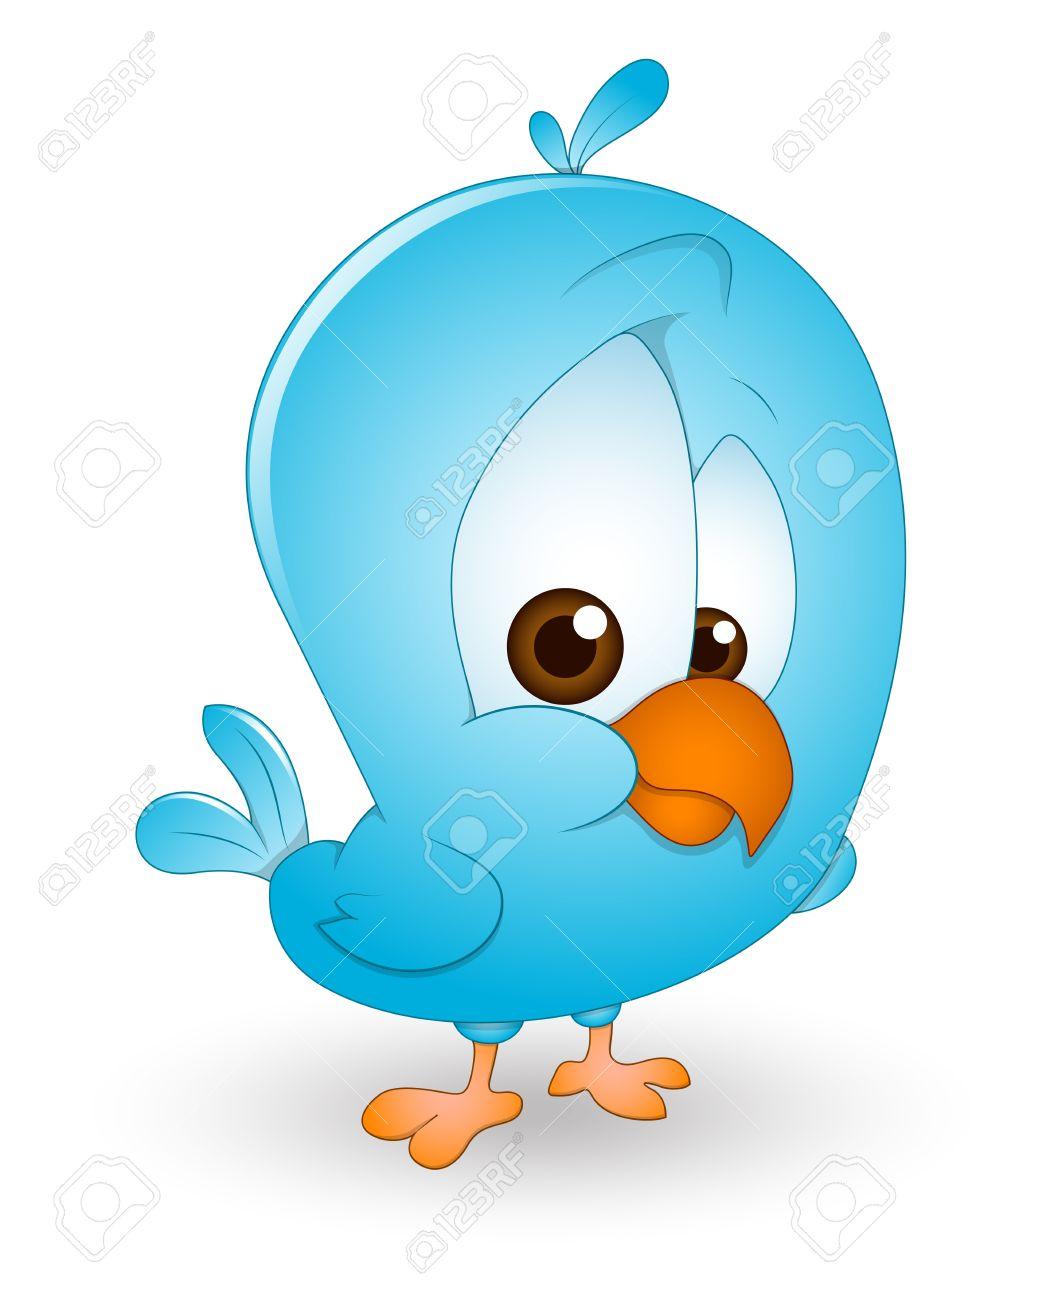 cute baby bird royalty free cliparts vectors and stock rh 123rf com baby bird hatching cartoon baby bird cartoon images